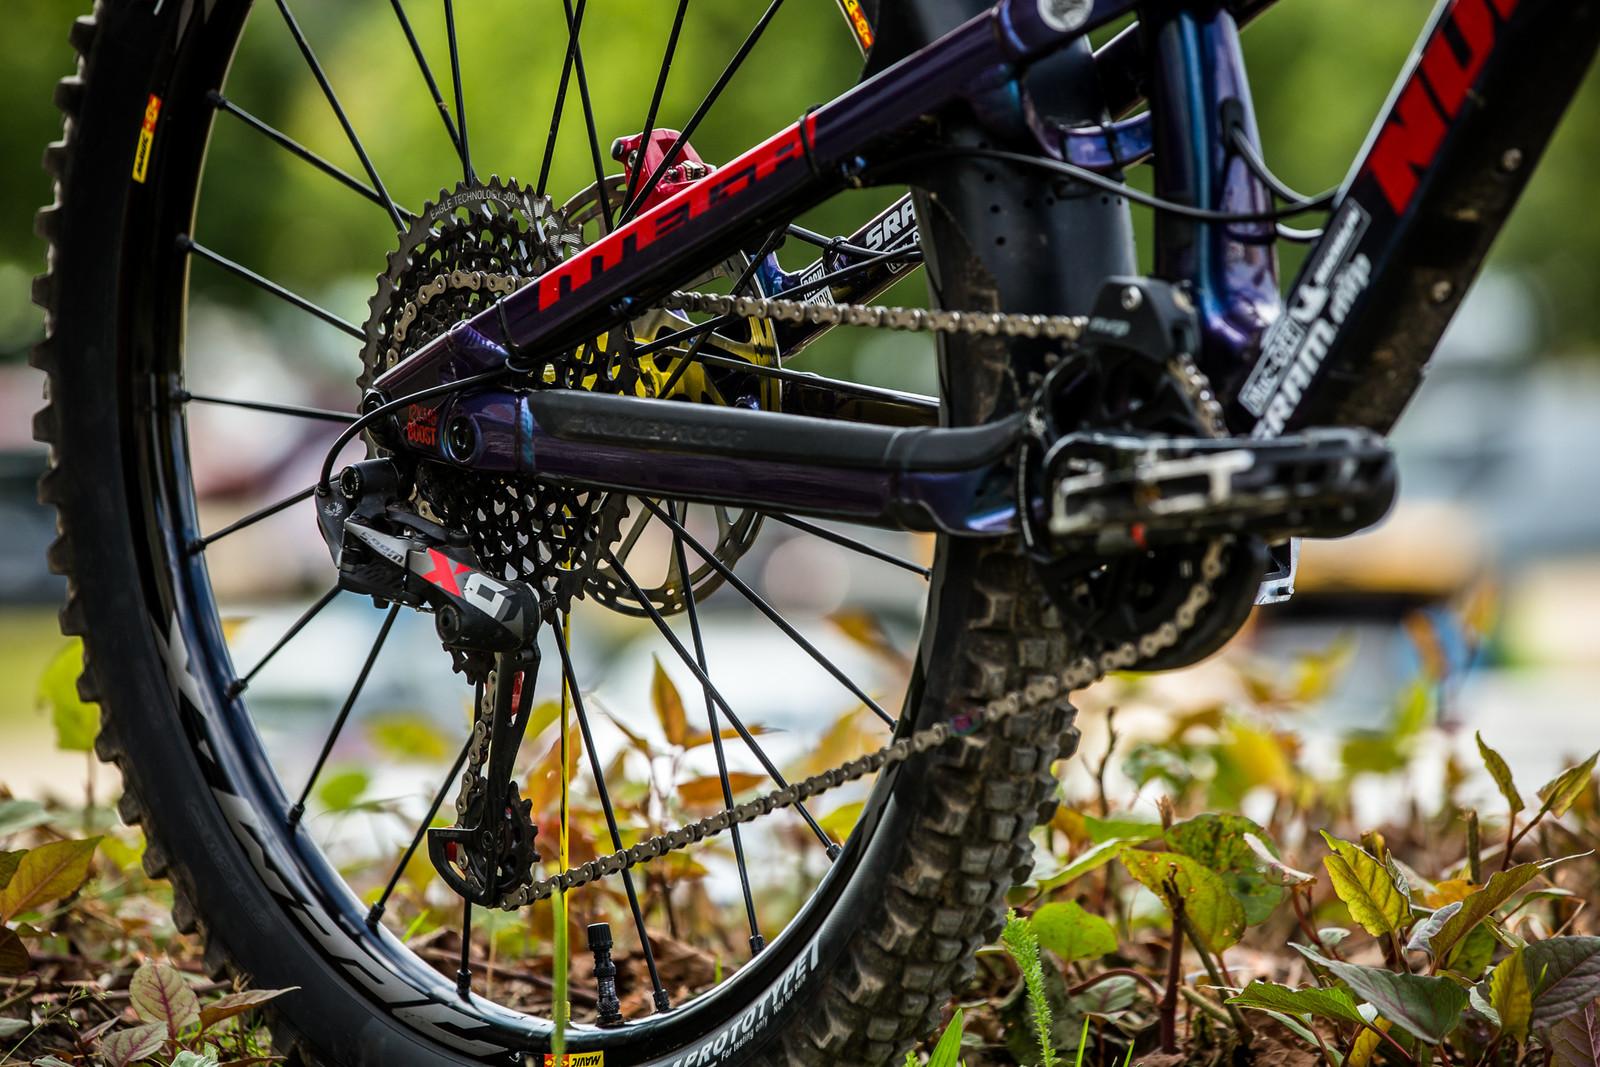 SRAM X01 Eagle Drivetrain - WINNING BIKE - Sam Hill's Nukeproof Mega 275 - Mountain Biking Pictures - Vital MTB